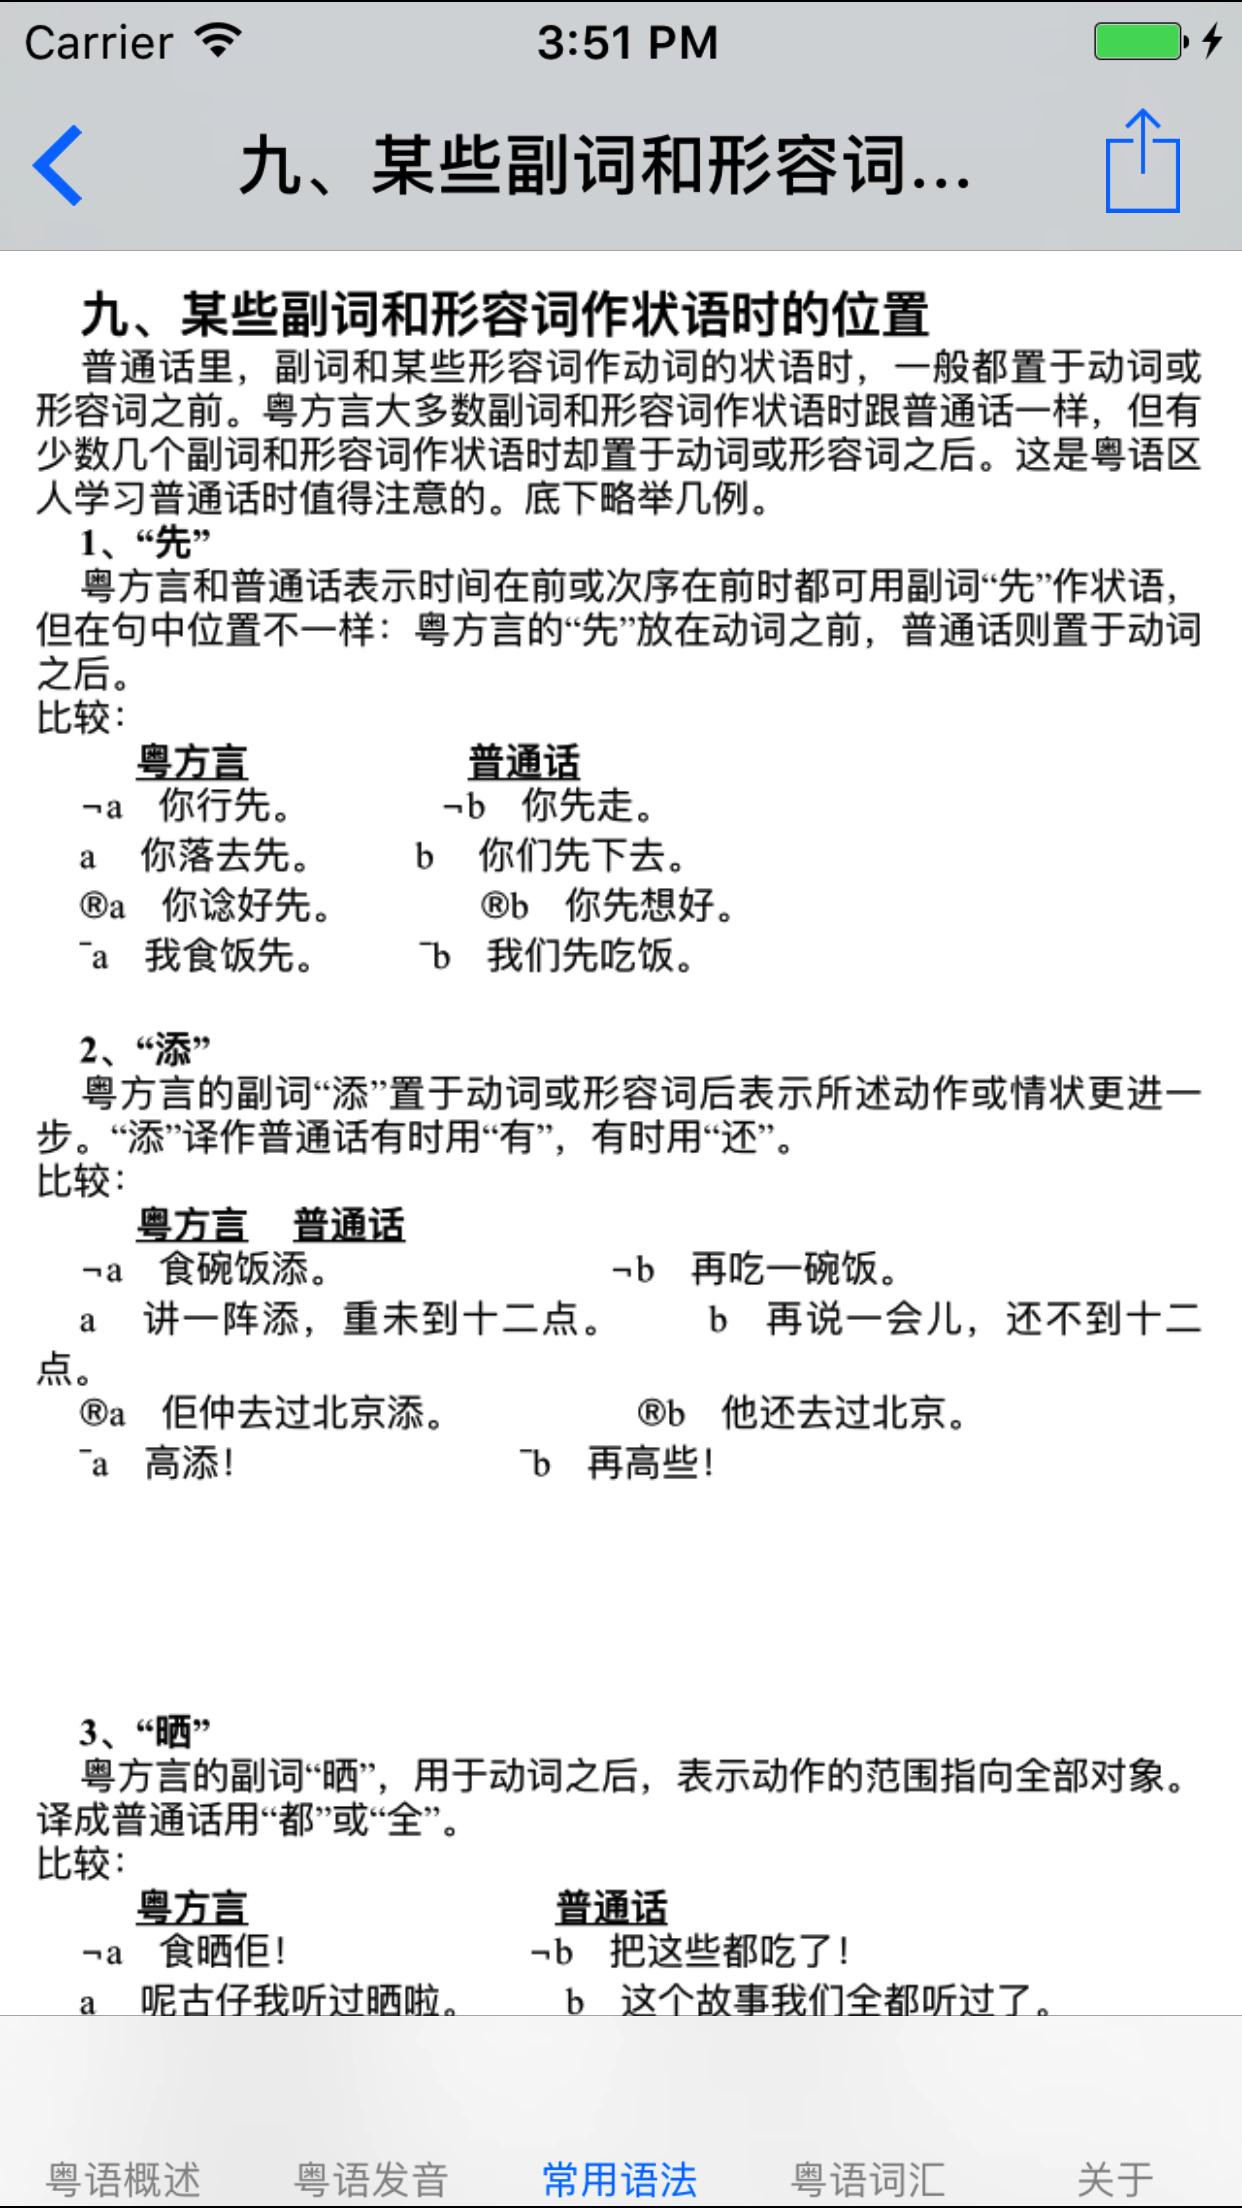 粤语自学教程 Screenshot